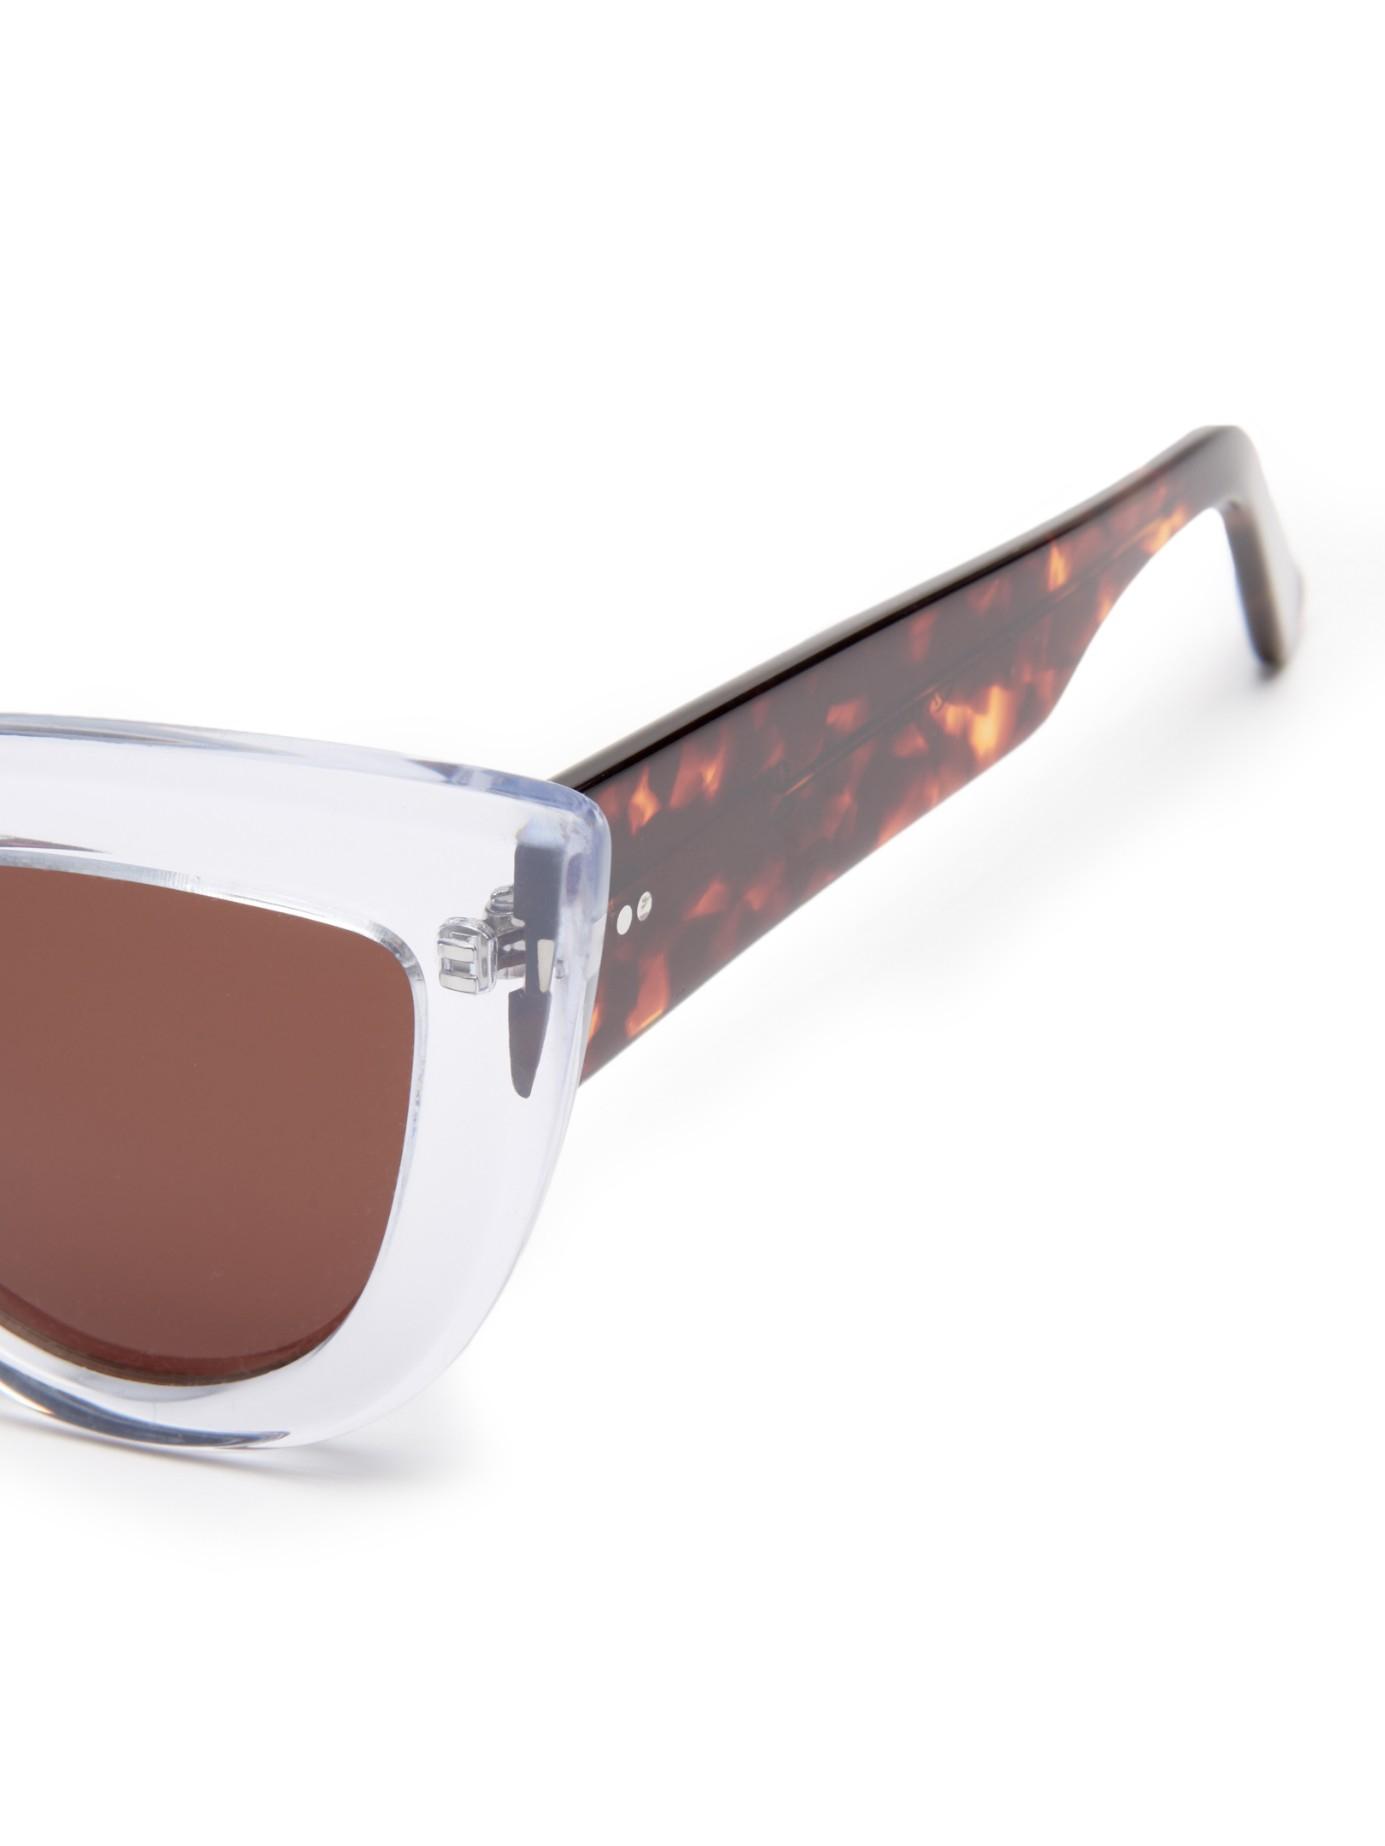 47984ab9fa Ellery Quixote Cat-eye Sunglasses - Lyst